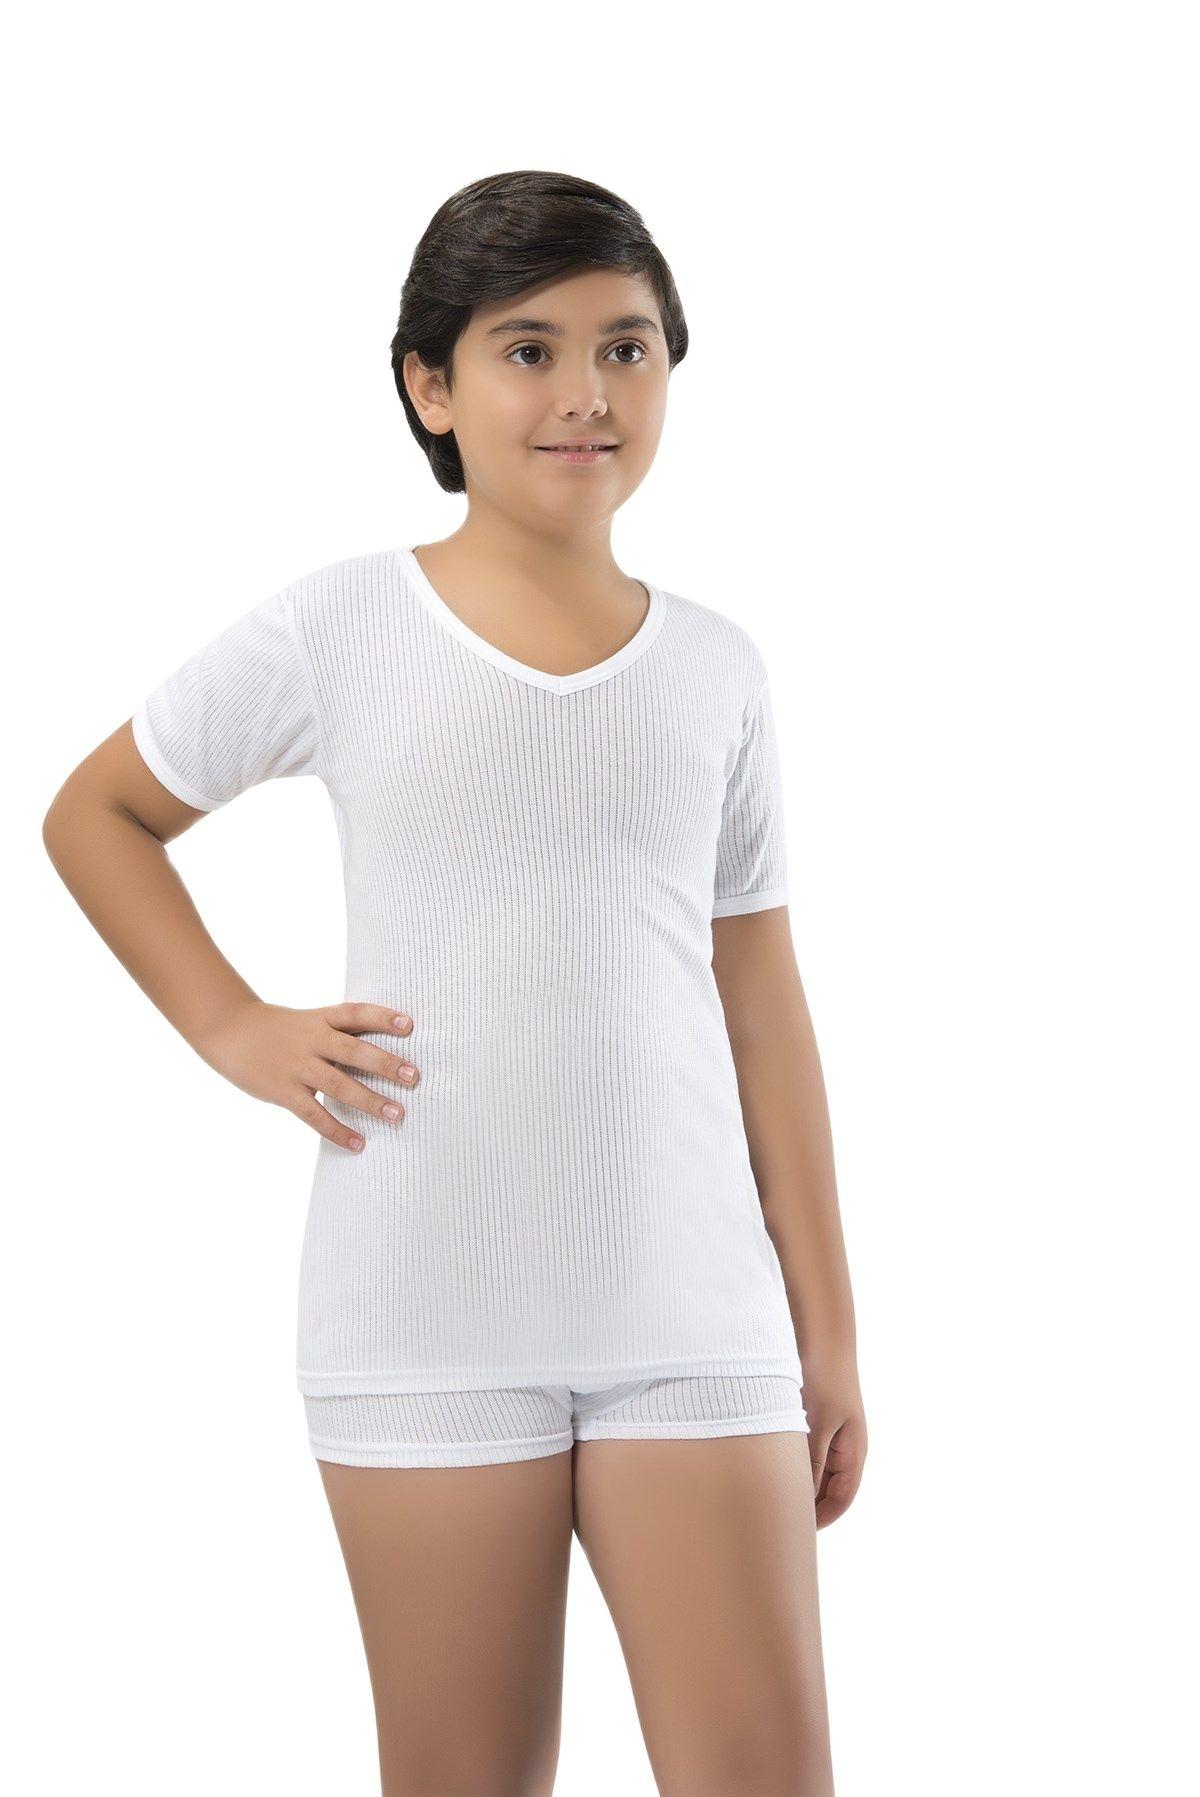 2-Pack White Striped Ribbon V-Neck Half Sleeve Boys  Undershirt Tops Soft Breathable Cotton Children Singlet Kids T-Shirt Baby